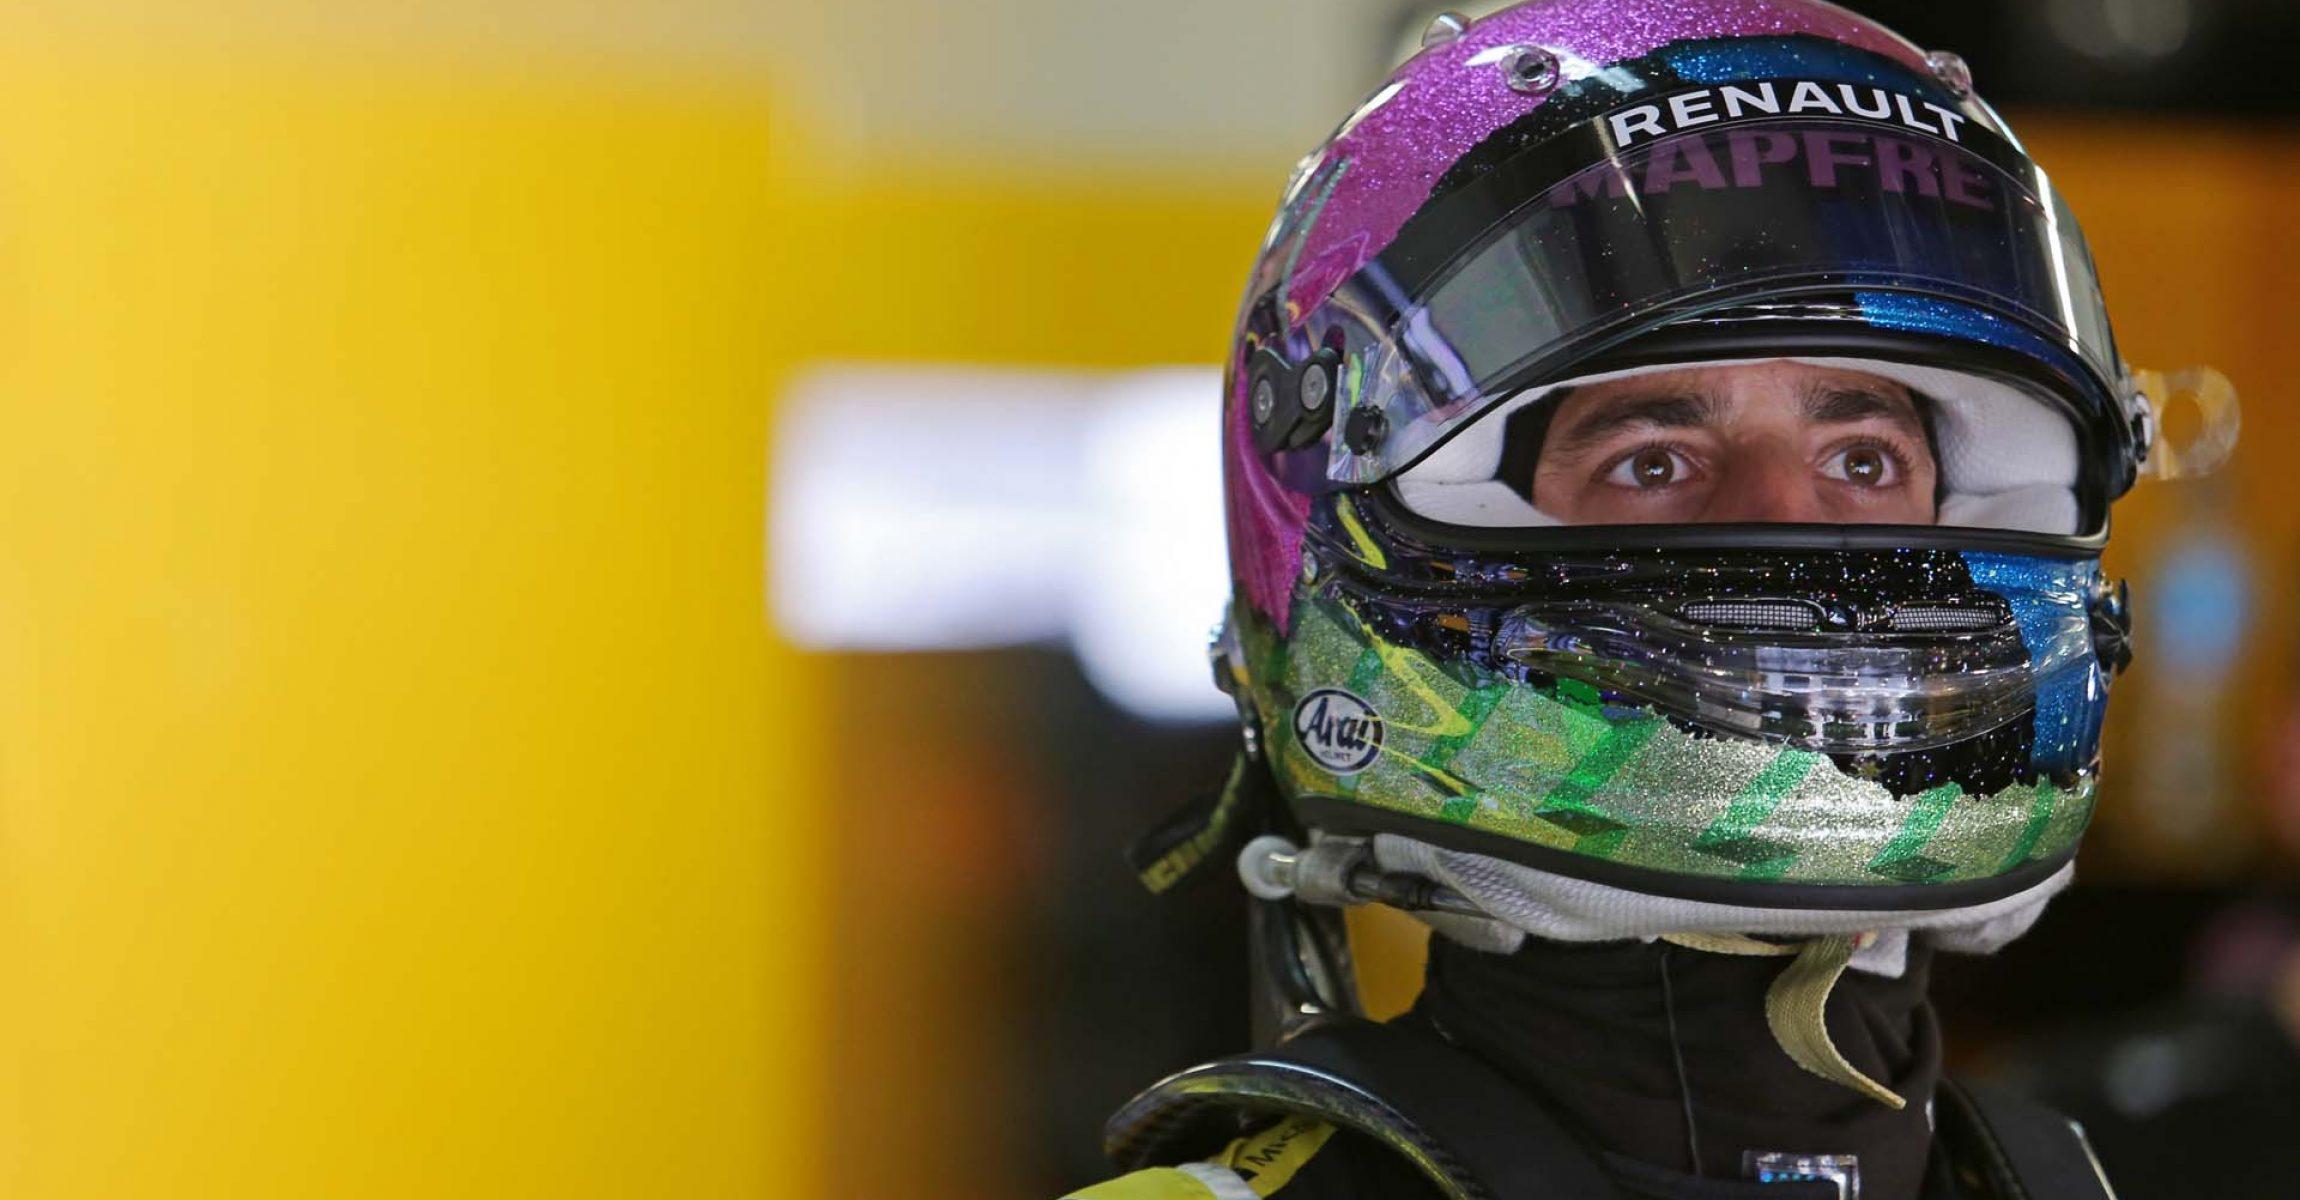 Daniel Ricciardo (AUS) Renault F1 Team. Russian Grand Prix, Friday 27th September 2019. Sochi Autodrom, Sochi, Russia.